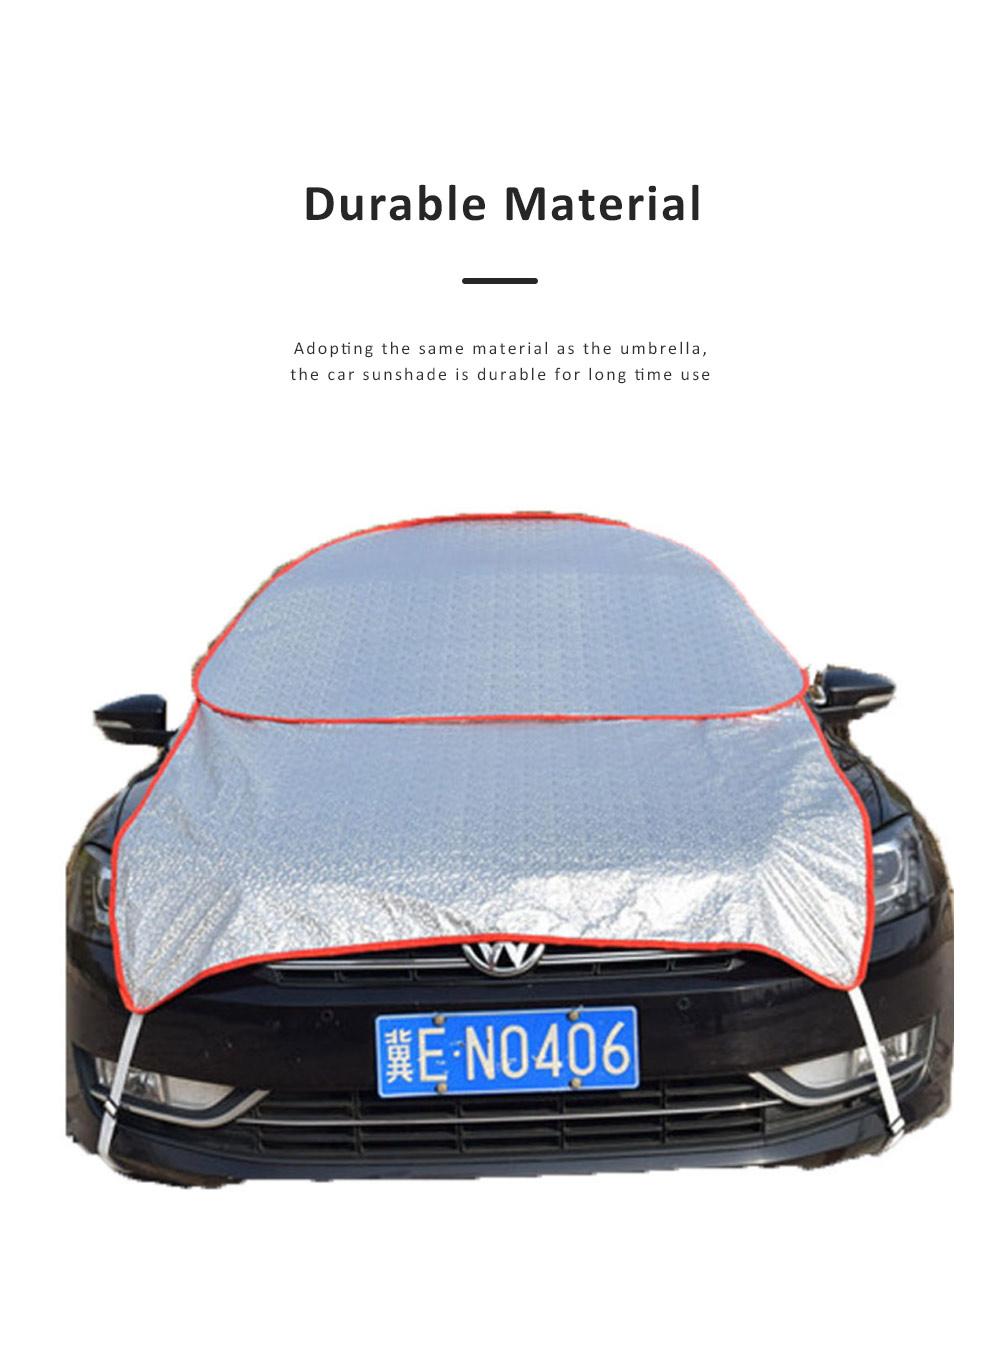 Universal Car Sunshade UV Ray Protector Cooler Umbrella Fabric Sunshade for Cars 3